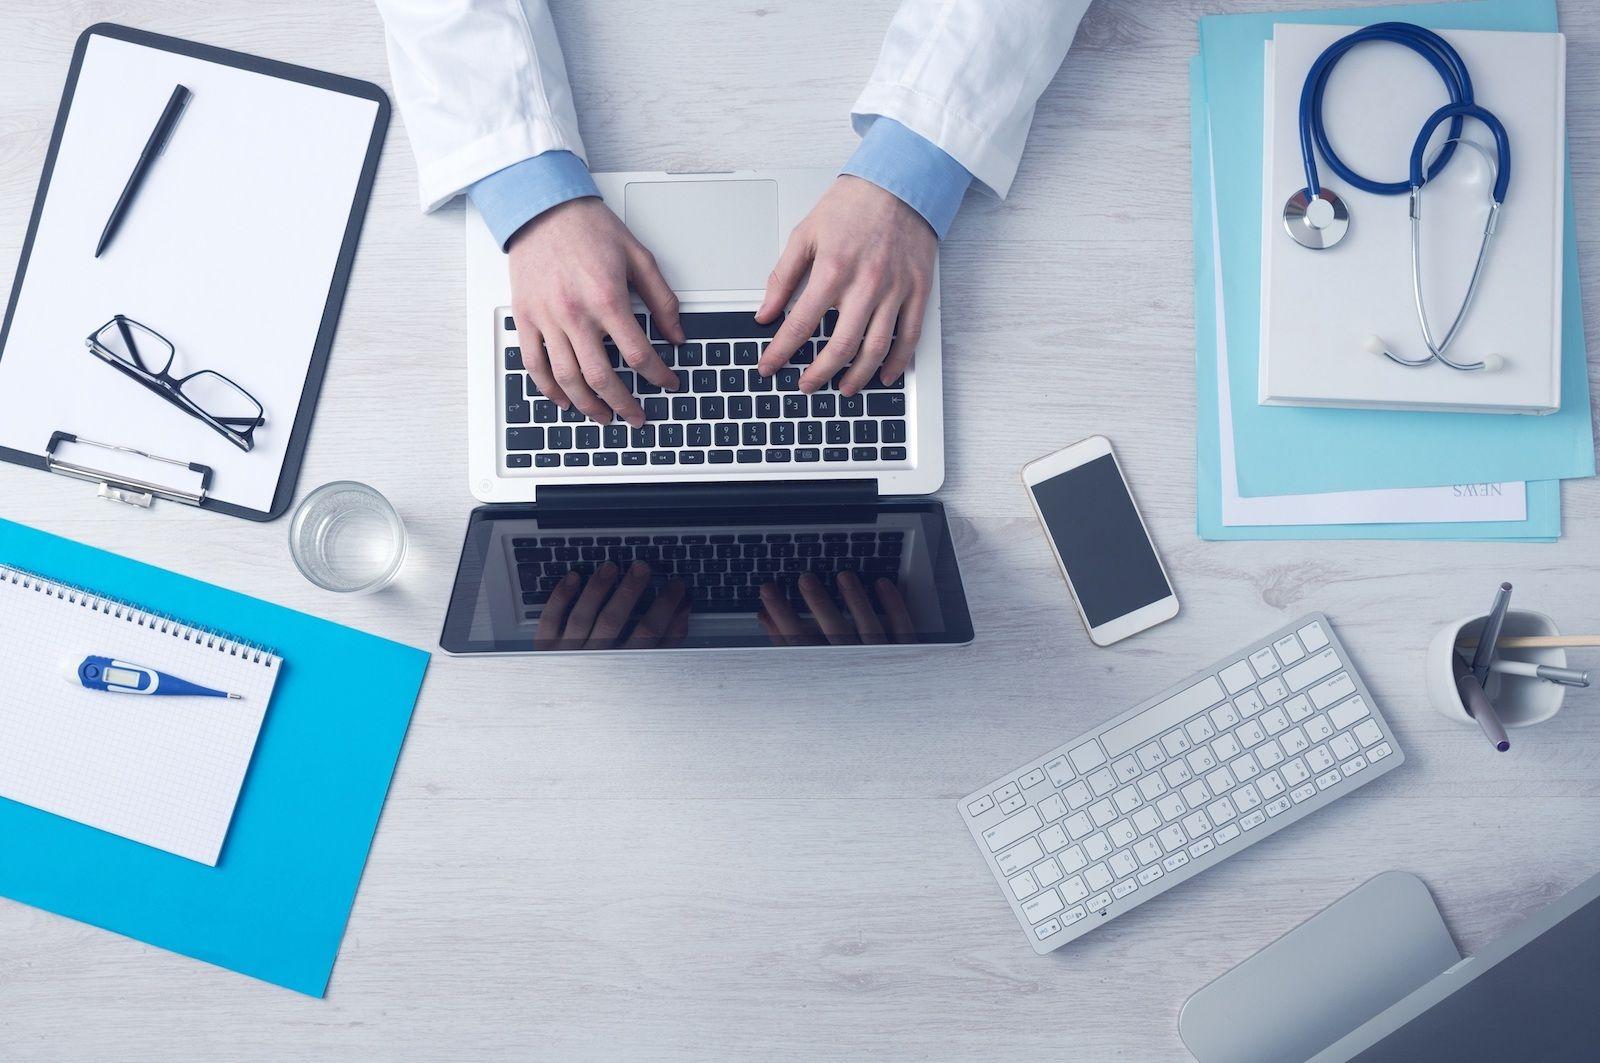 #MedicalWriter for #Dental Blog @DentalContent  Post free #meded & #medcomms jobs via @_scienterrific_ https://t.co/N7ZI2sxCSM